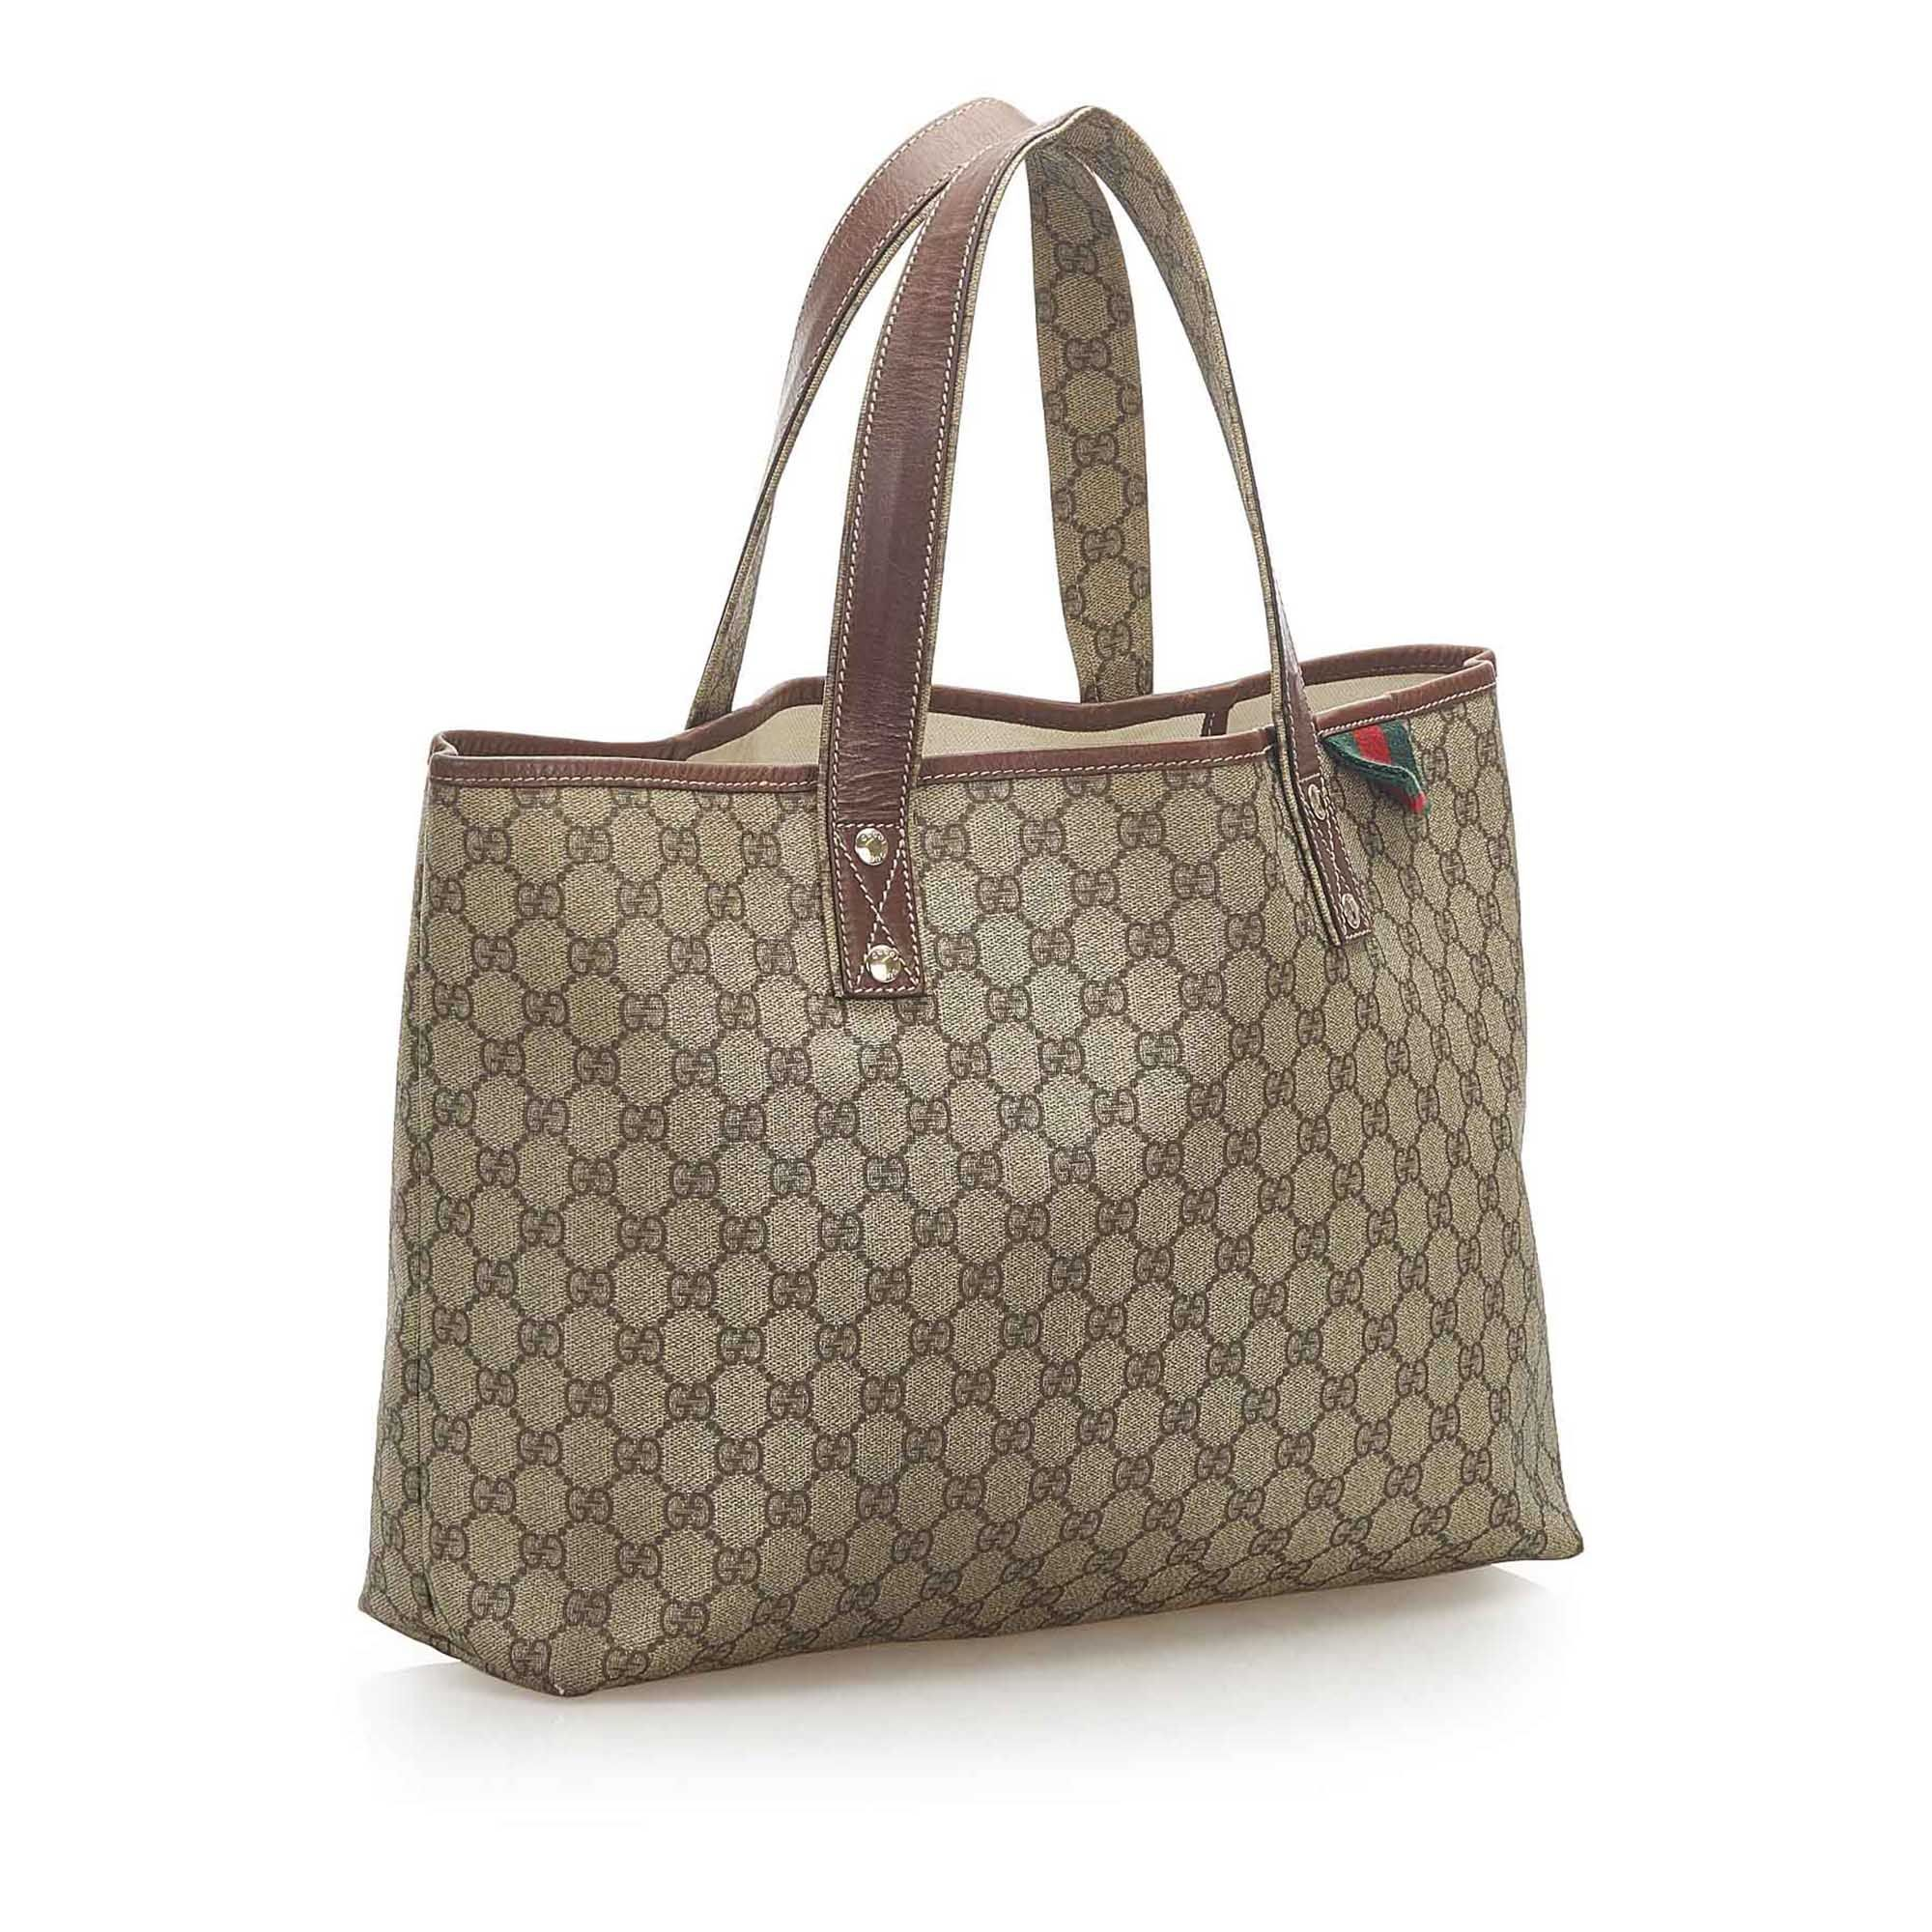 Vintage Gucci GG Supreme Web Tote Bag Brown